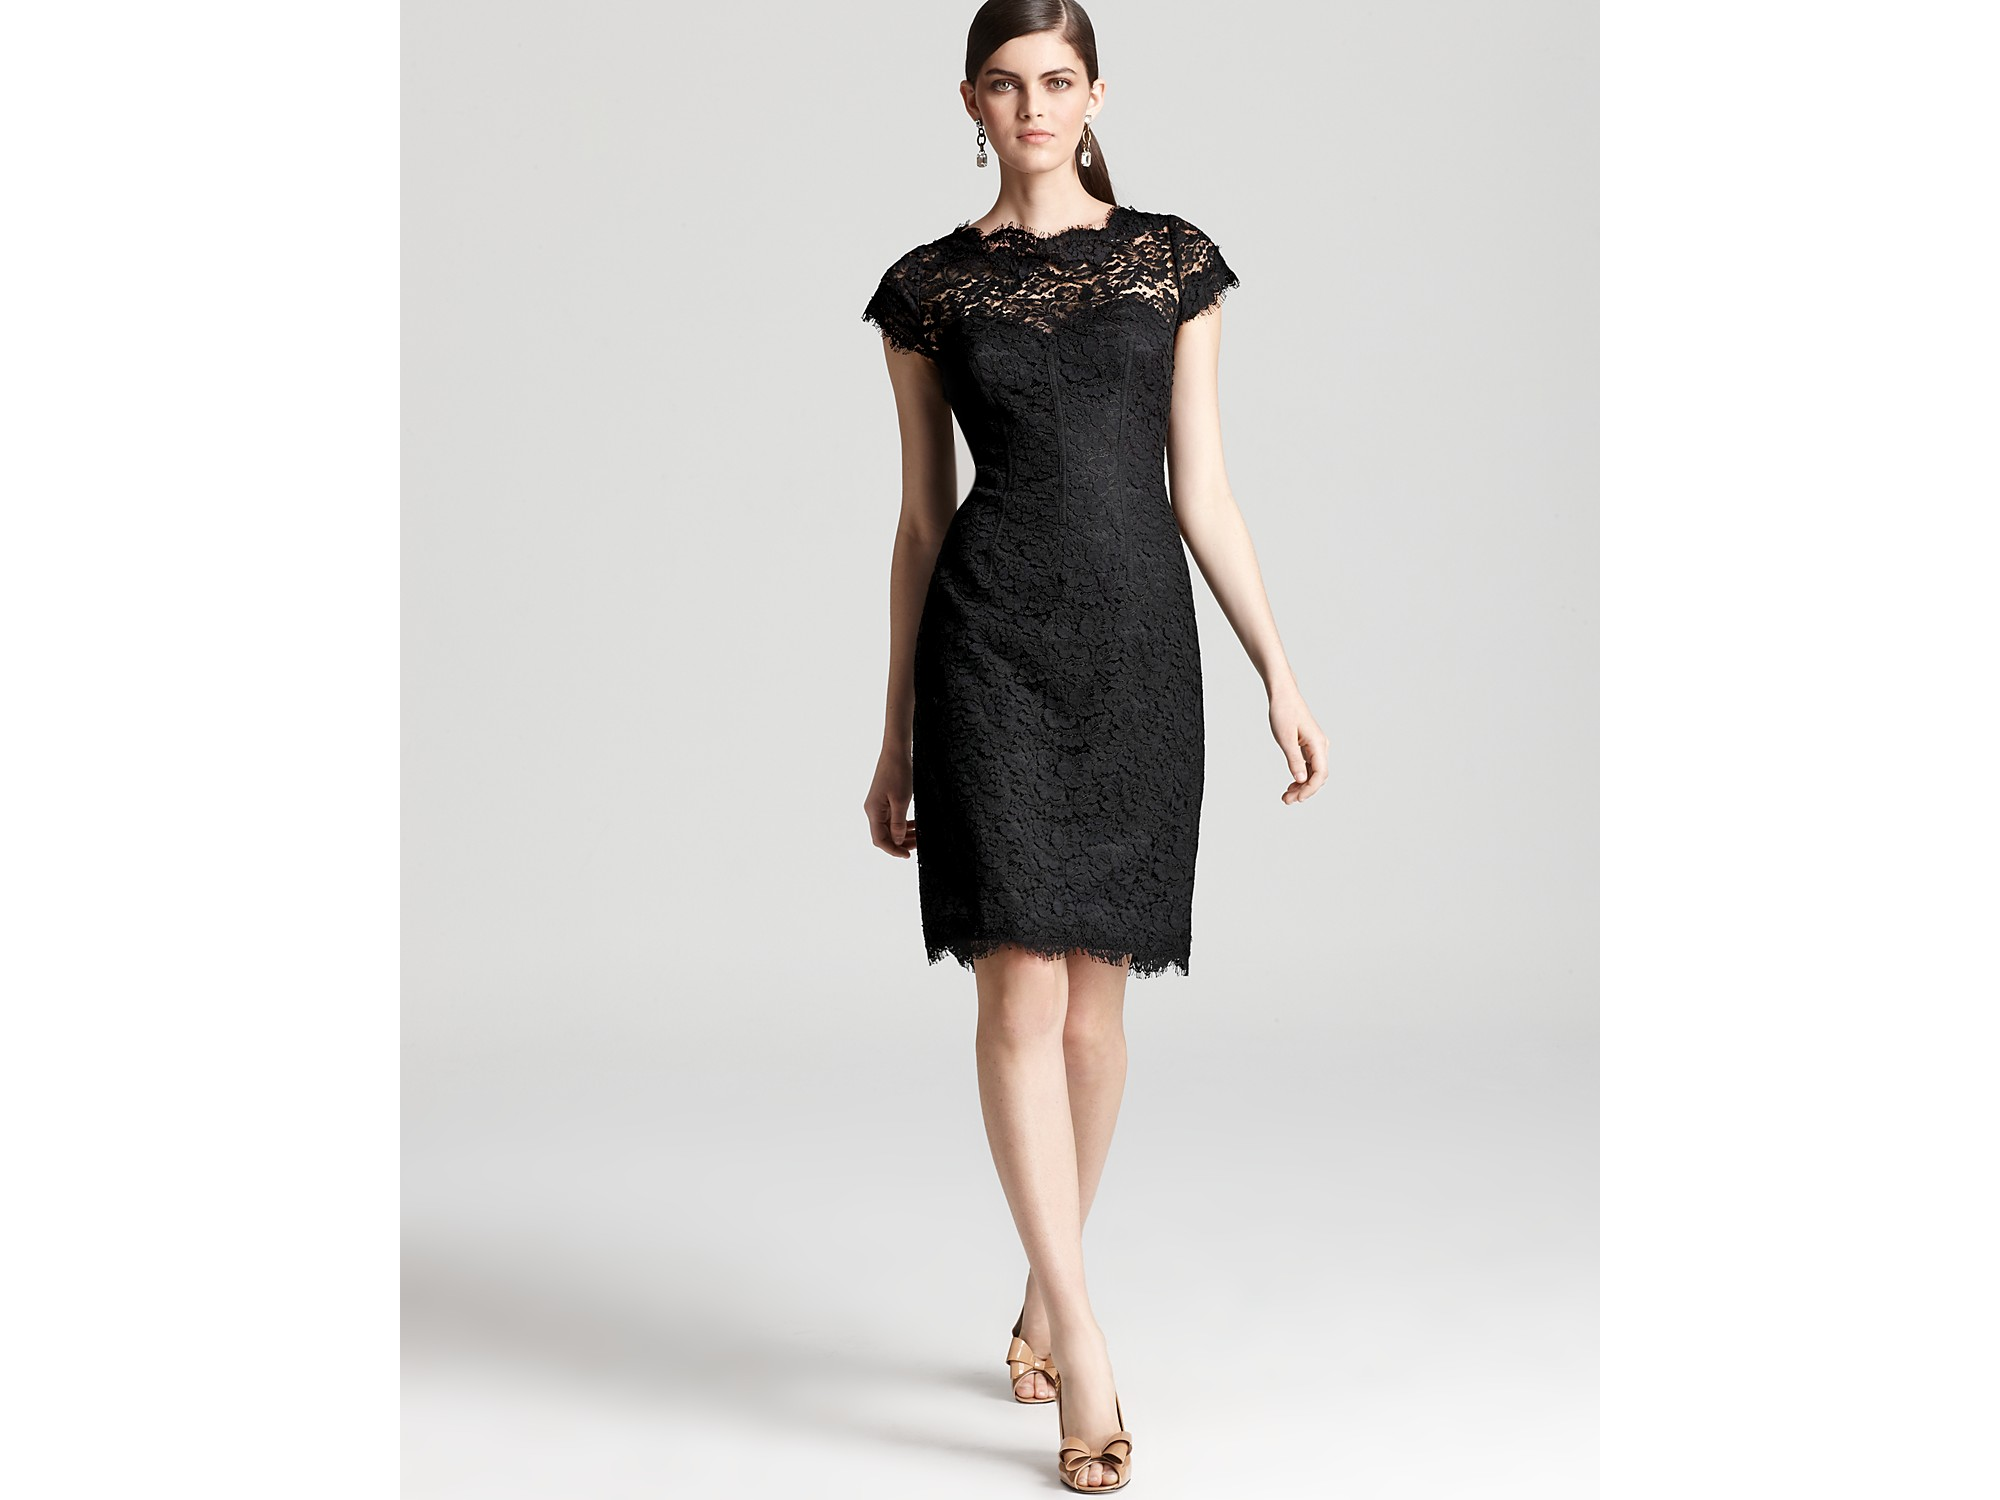 Black Cap Sleeve Lace Dress